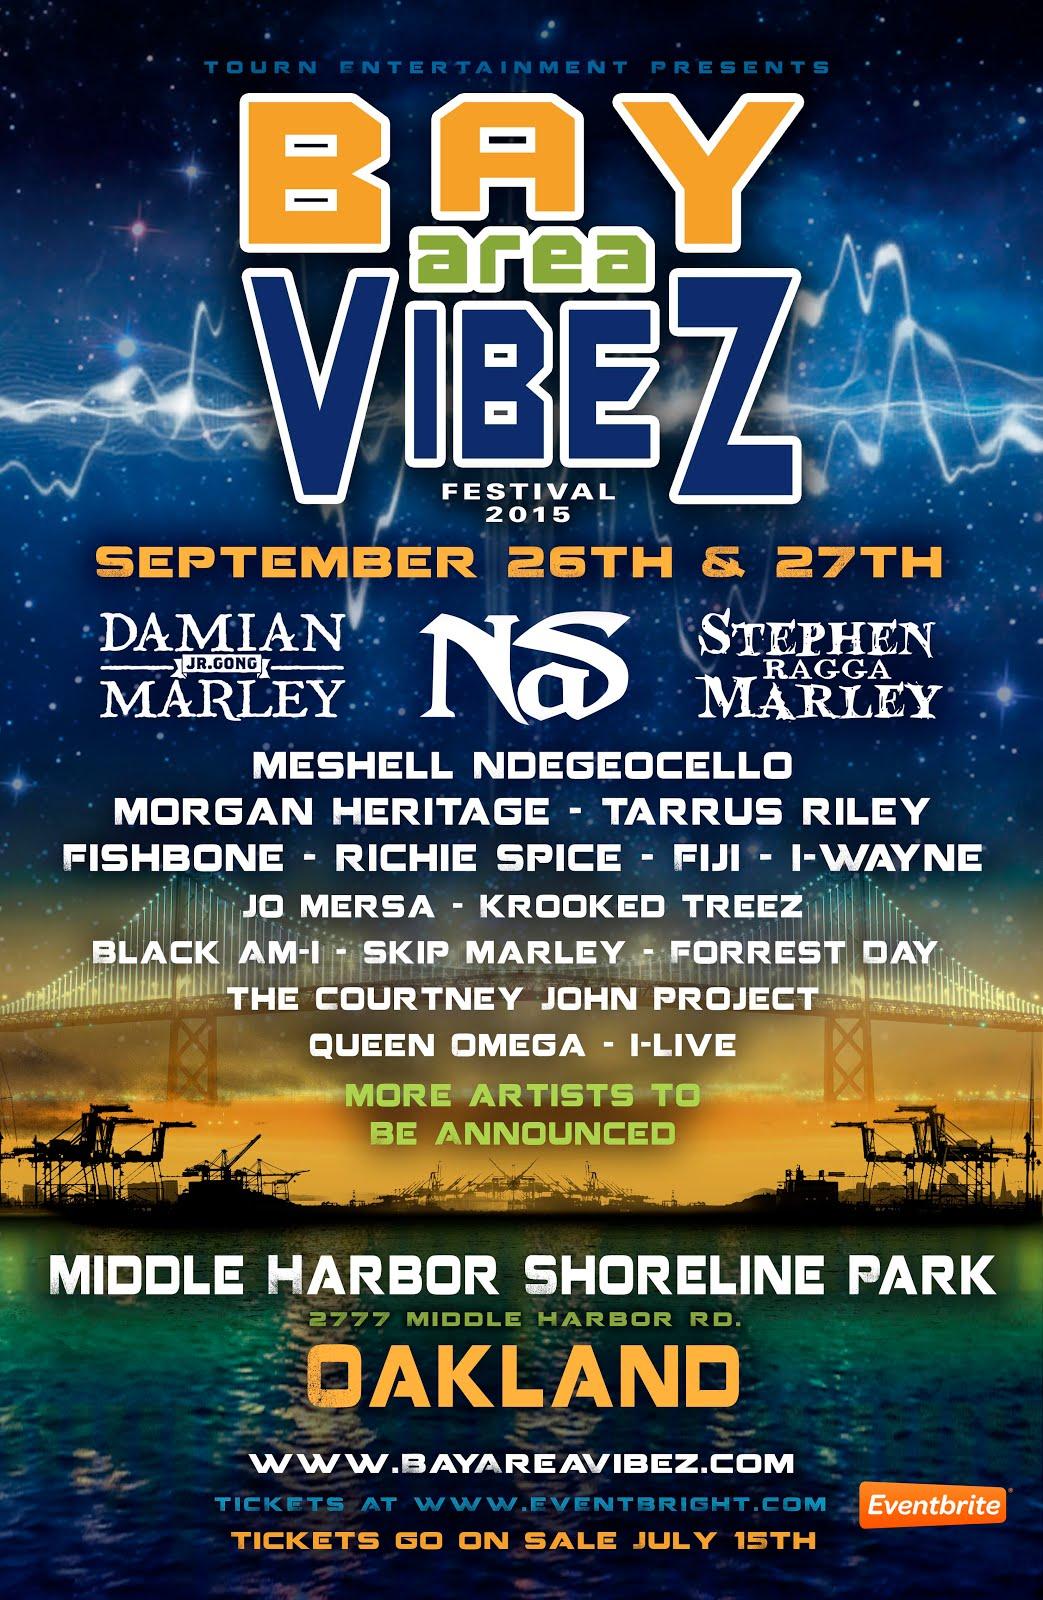 Bay Area Vibez Festival